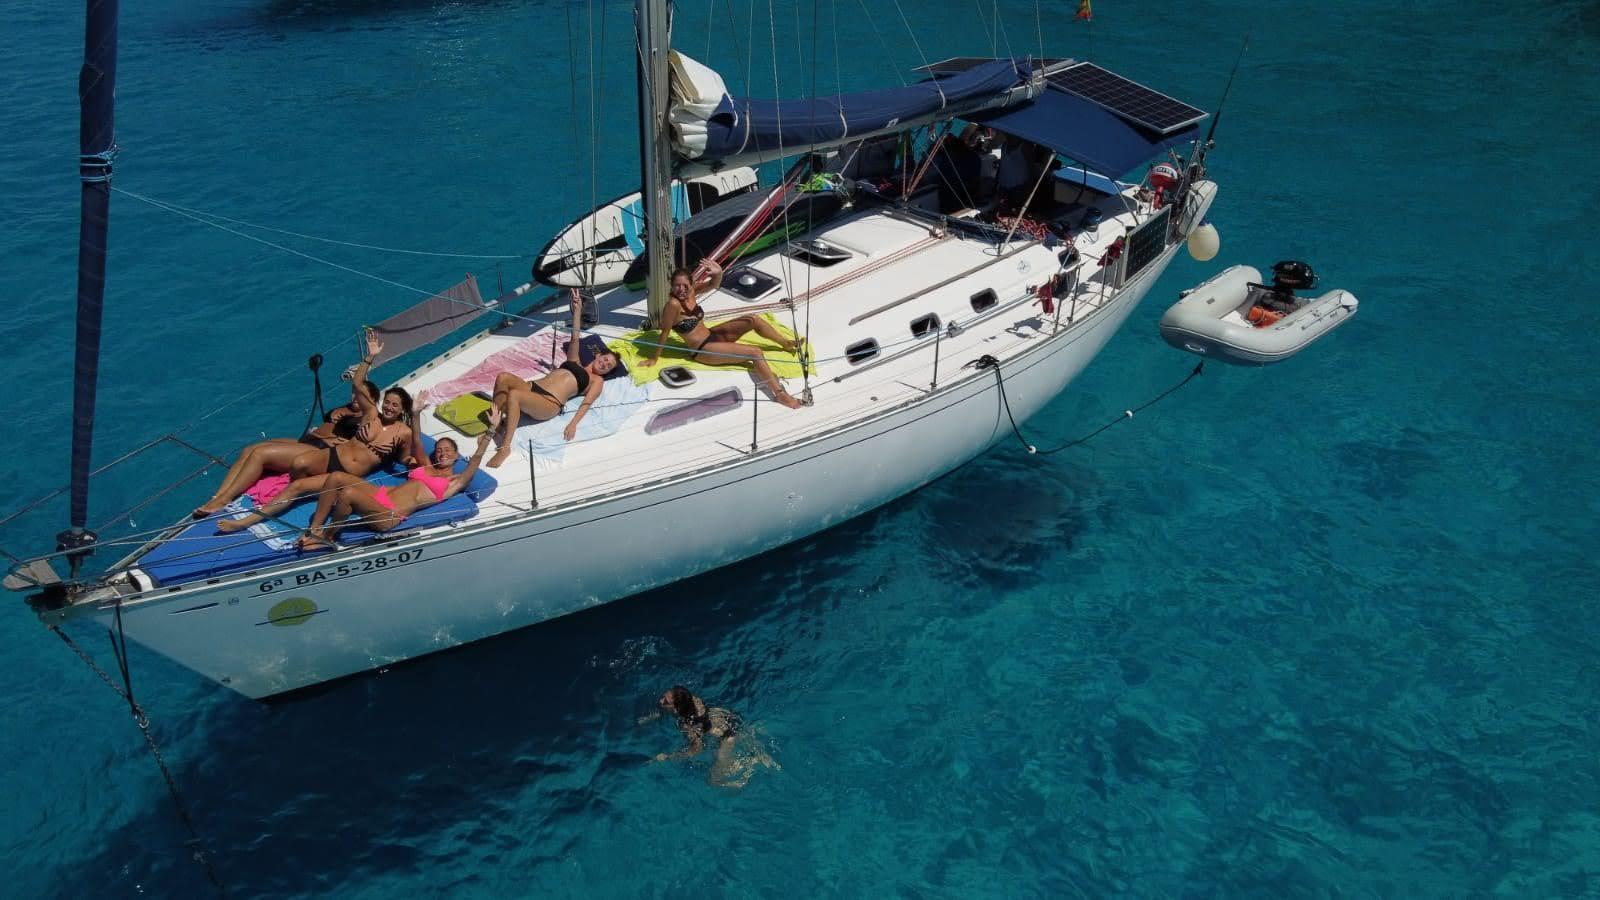 fondeo en Formentera barco de alquiler